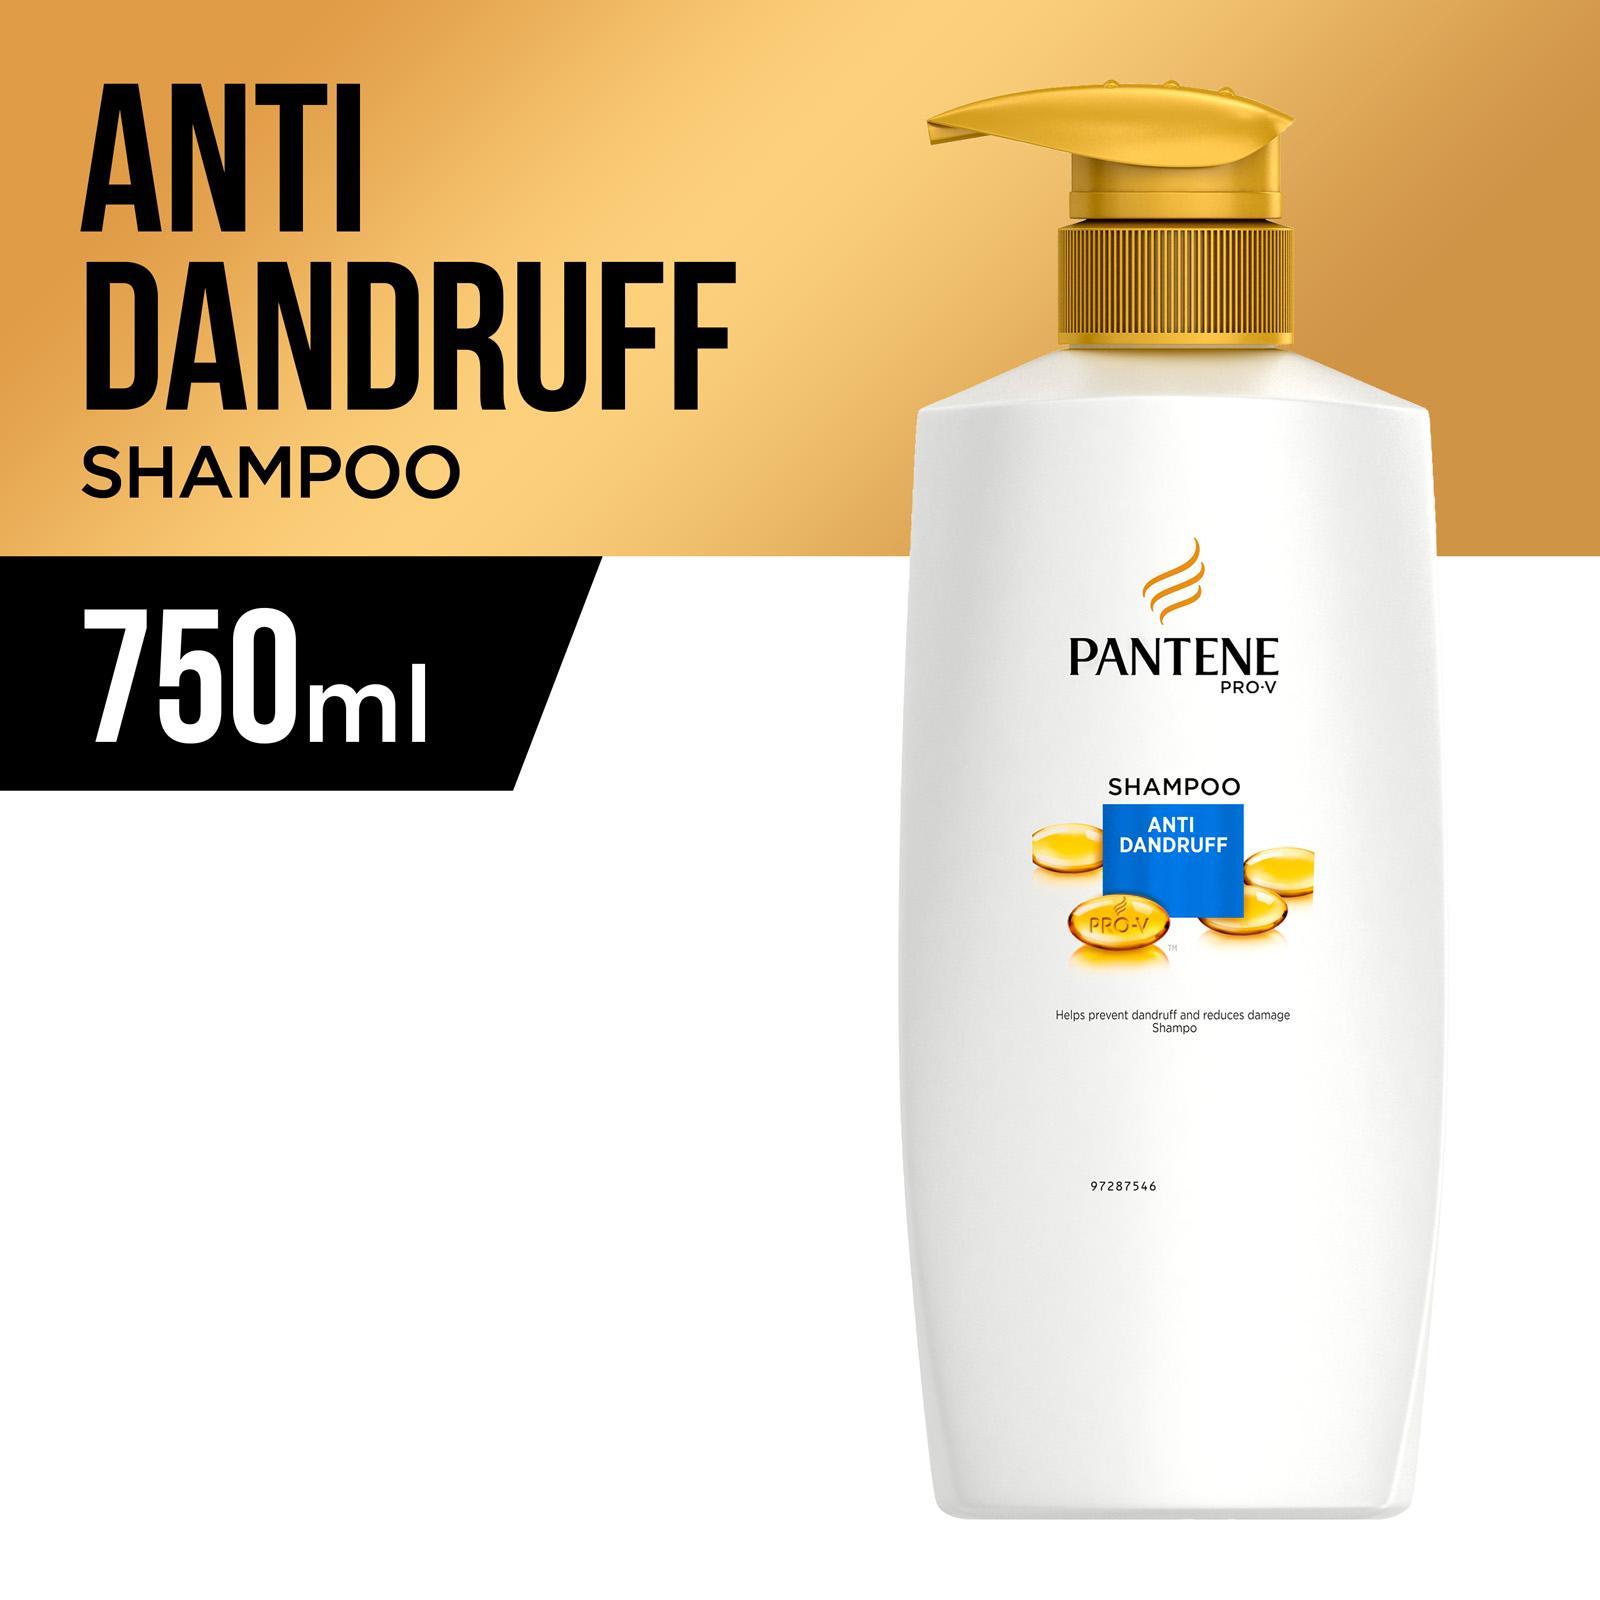 PANTENE pro v anti dandruff shampoo 670ml